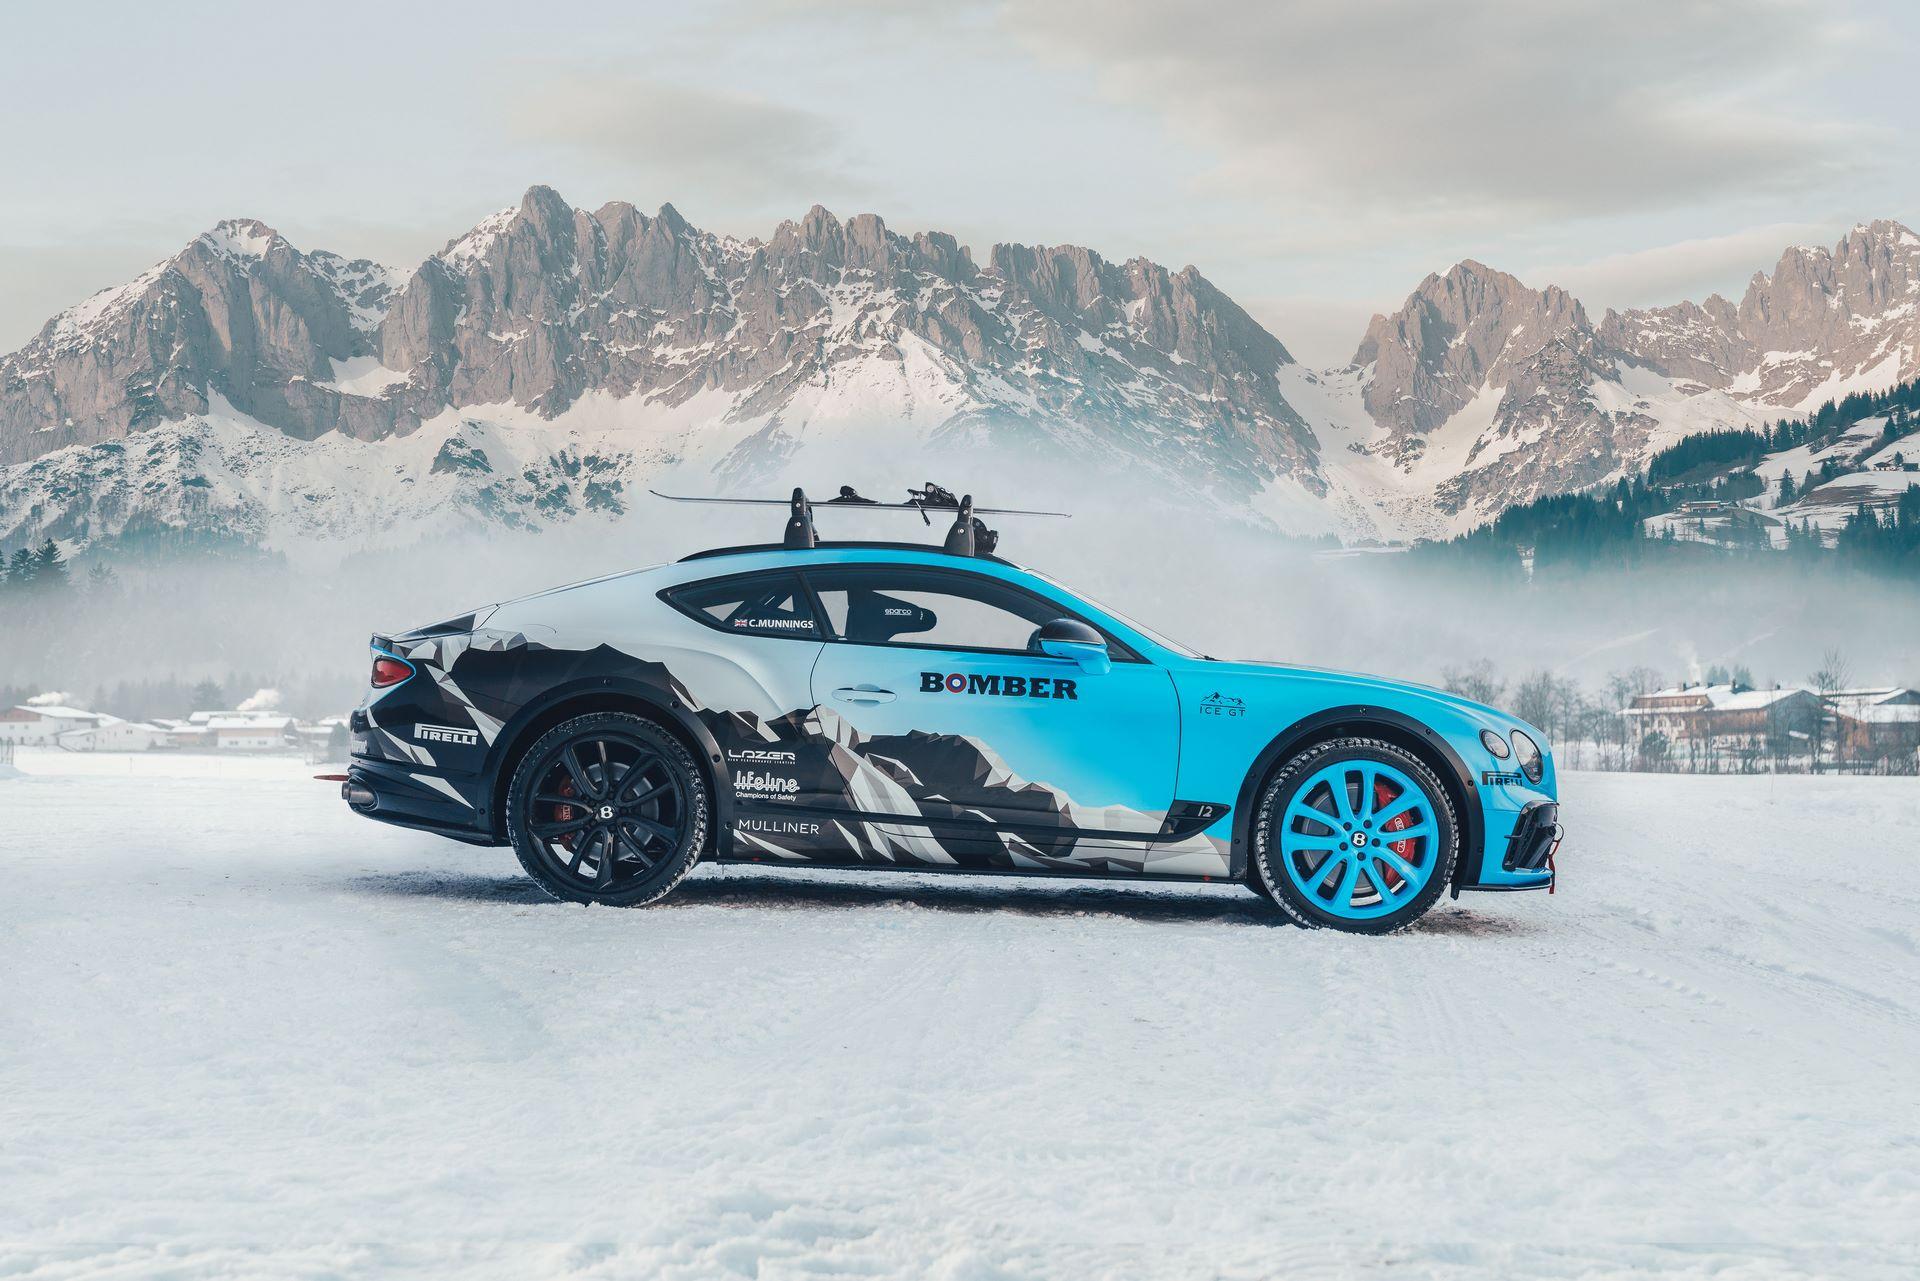 Bentley-Continental-GT-Ice-Race-2020-3